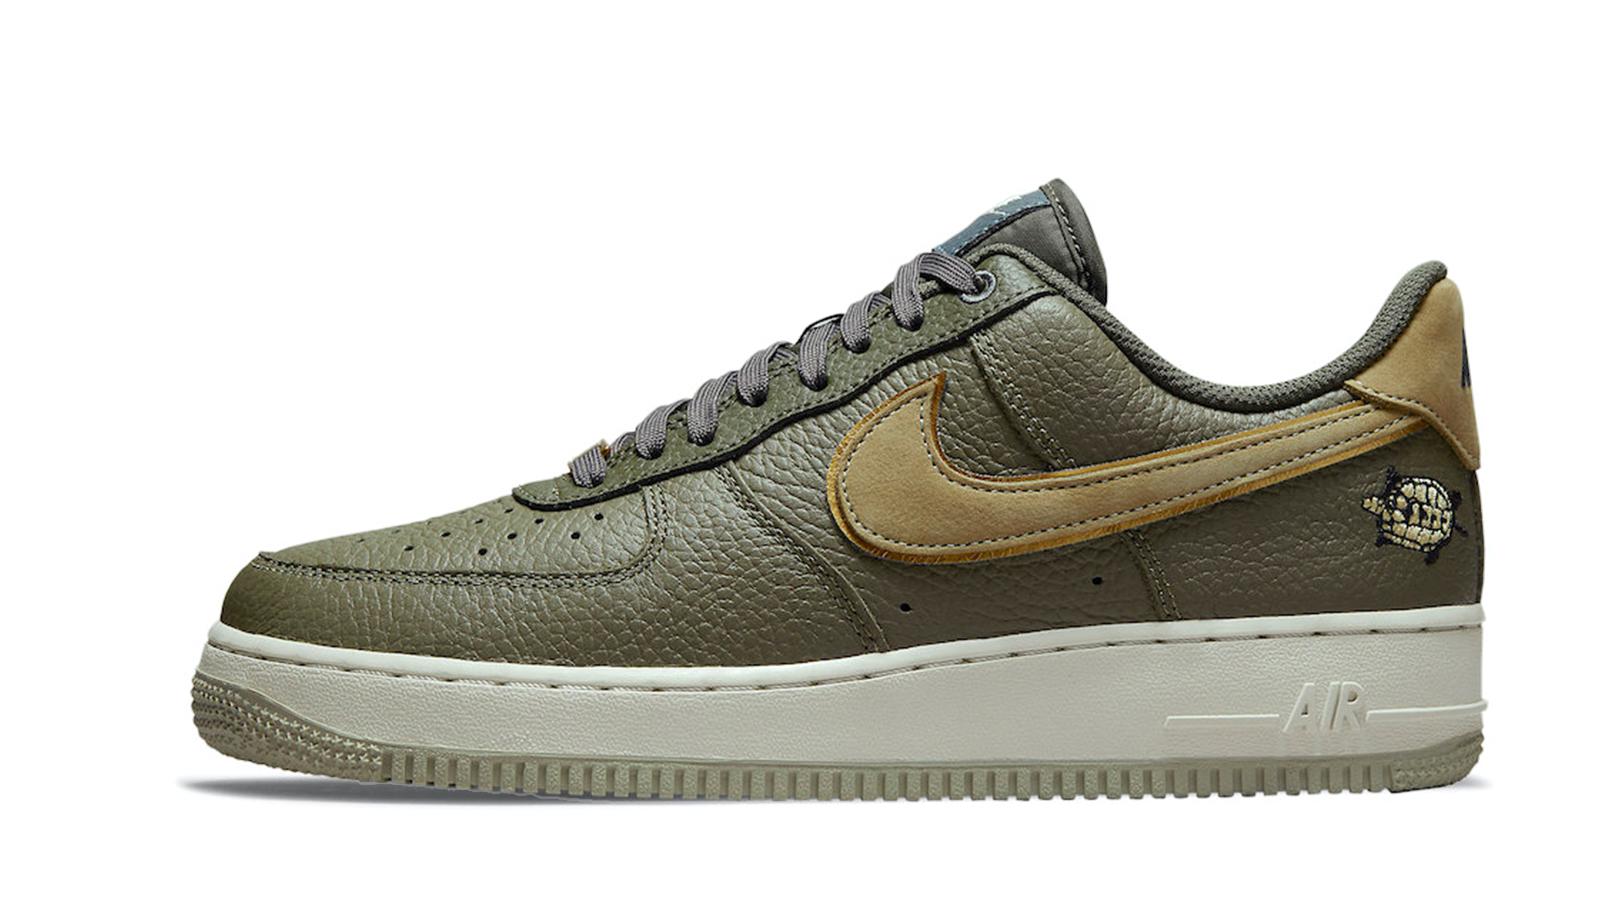 Nike Air Force 1 Low Turtle DA8482-200